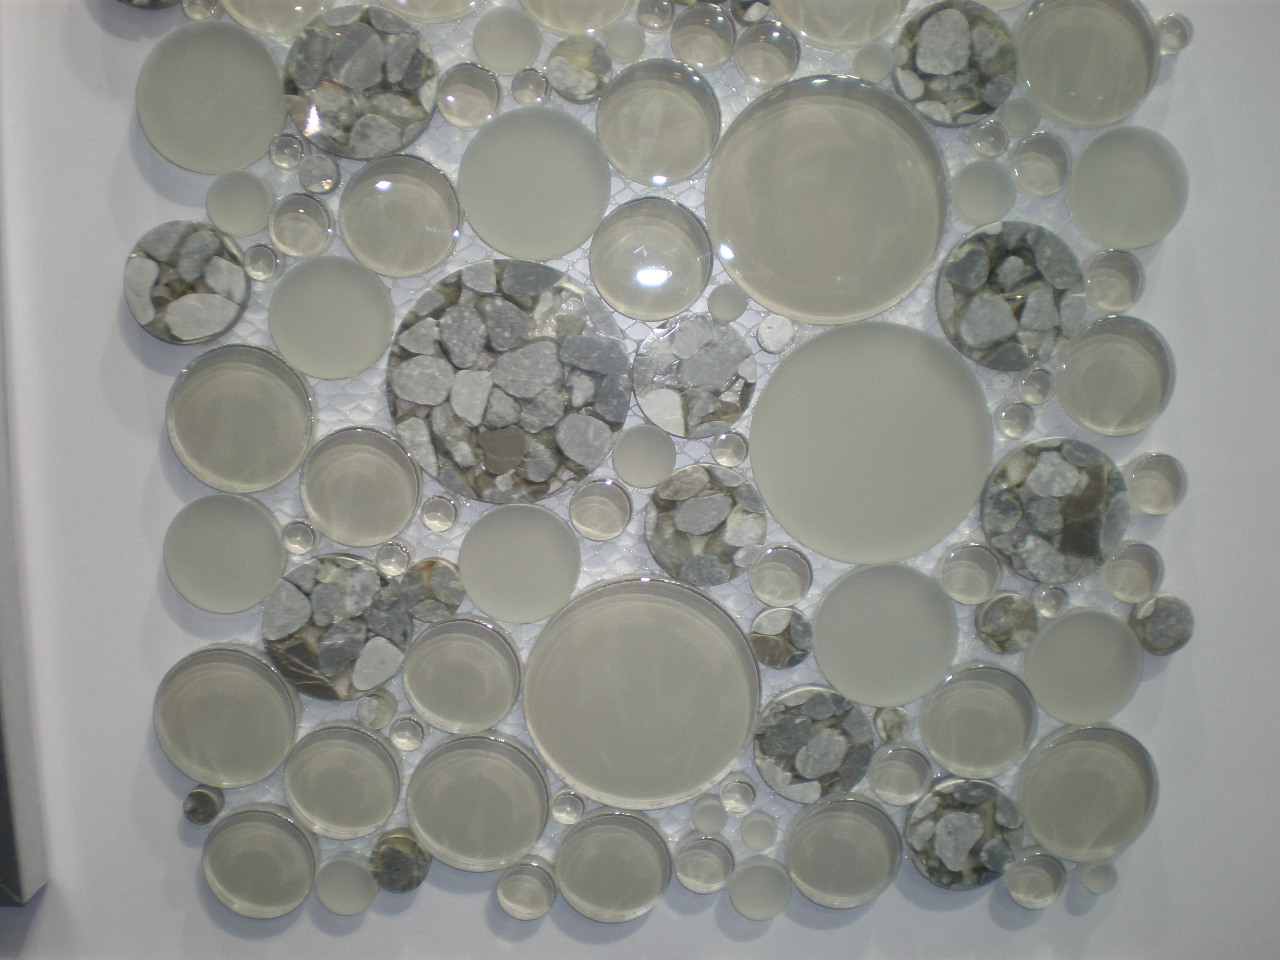 New Round Mosaic Tiles Kitchen Studio Of Naples Inc